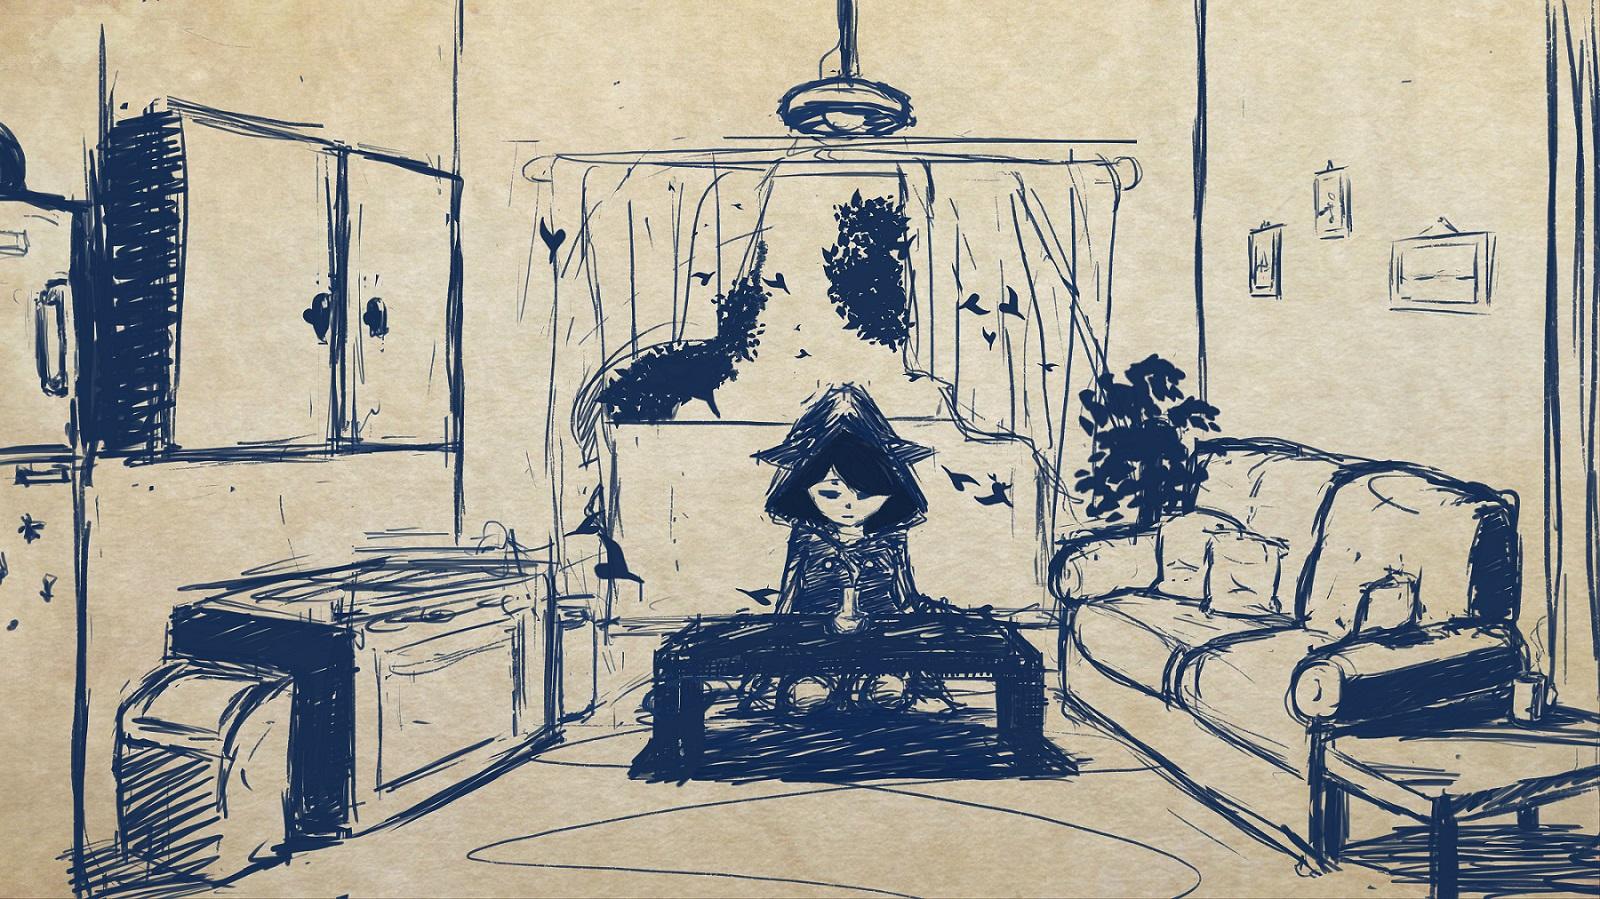 Solitude by Keetox